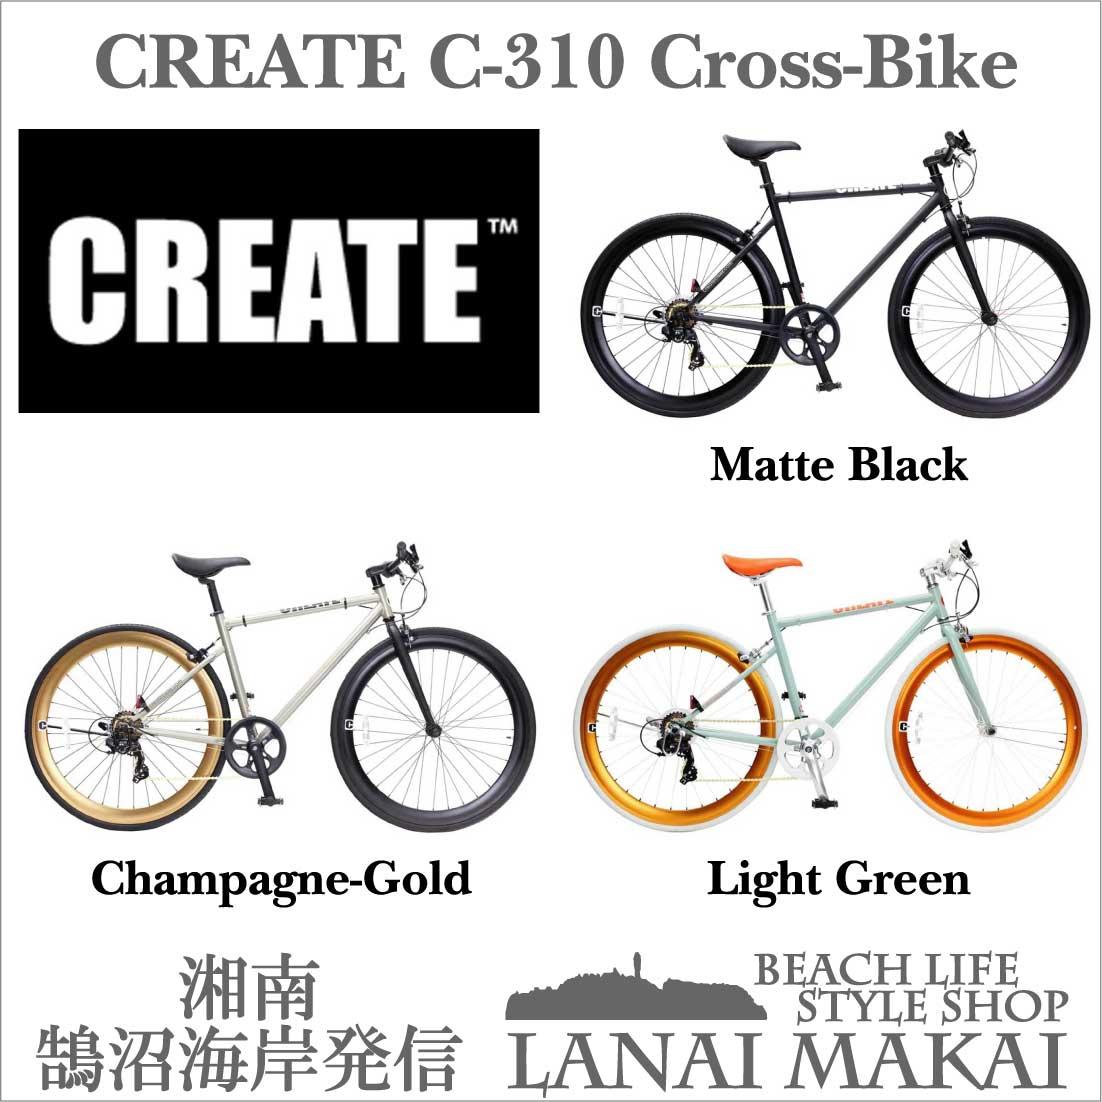 "【CREATE BIKES C-310 CROSS-BIKE】外装7段変速 クロスバイク""湘南鵠沼海岸発信""自転車 ロードバイク メンズ レディース 700C クリエイトバイク"